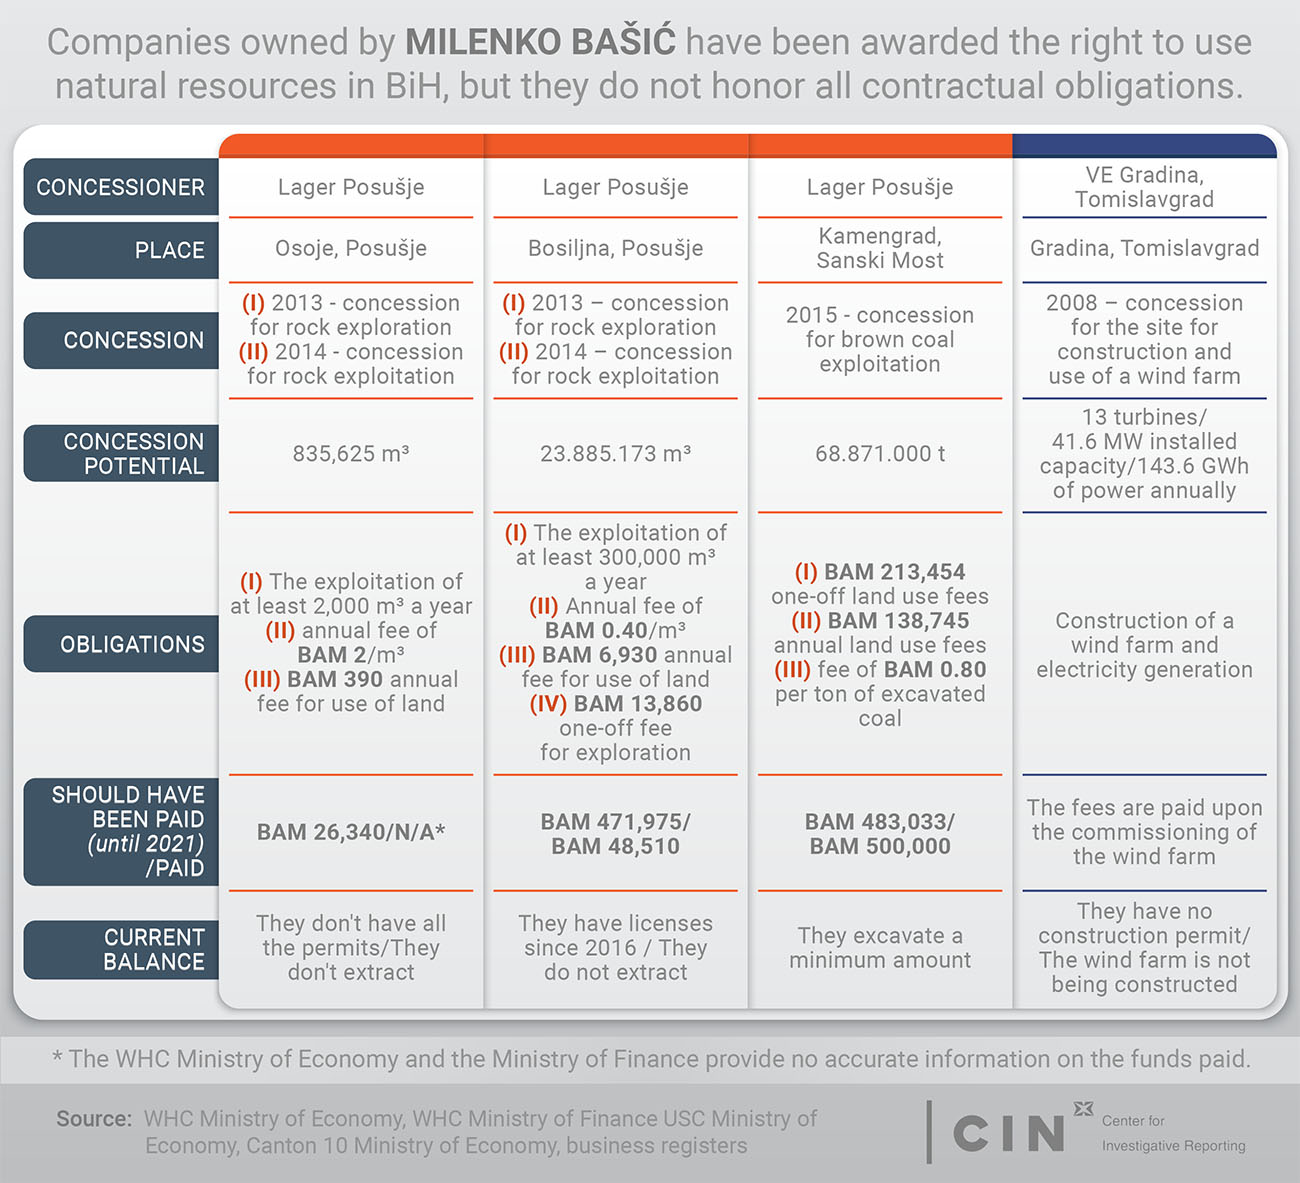 MIlenko Bačić's concessions in BiH